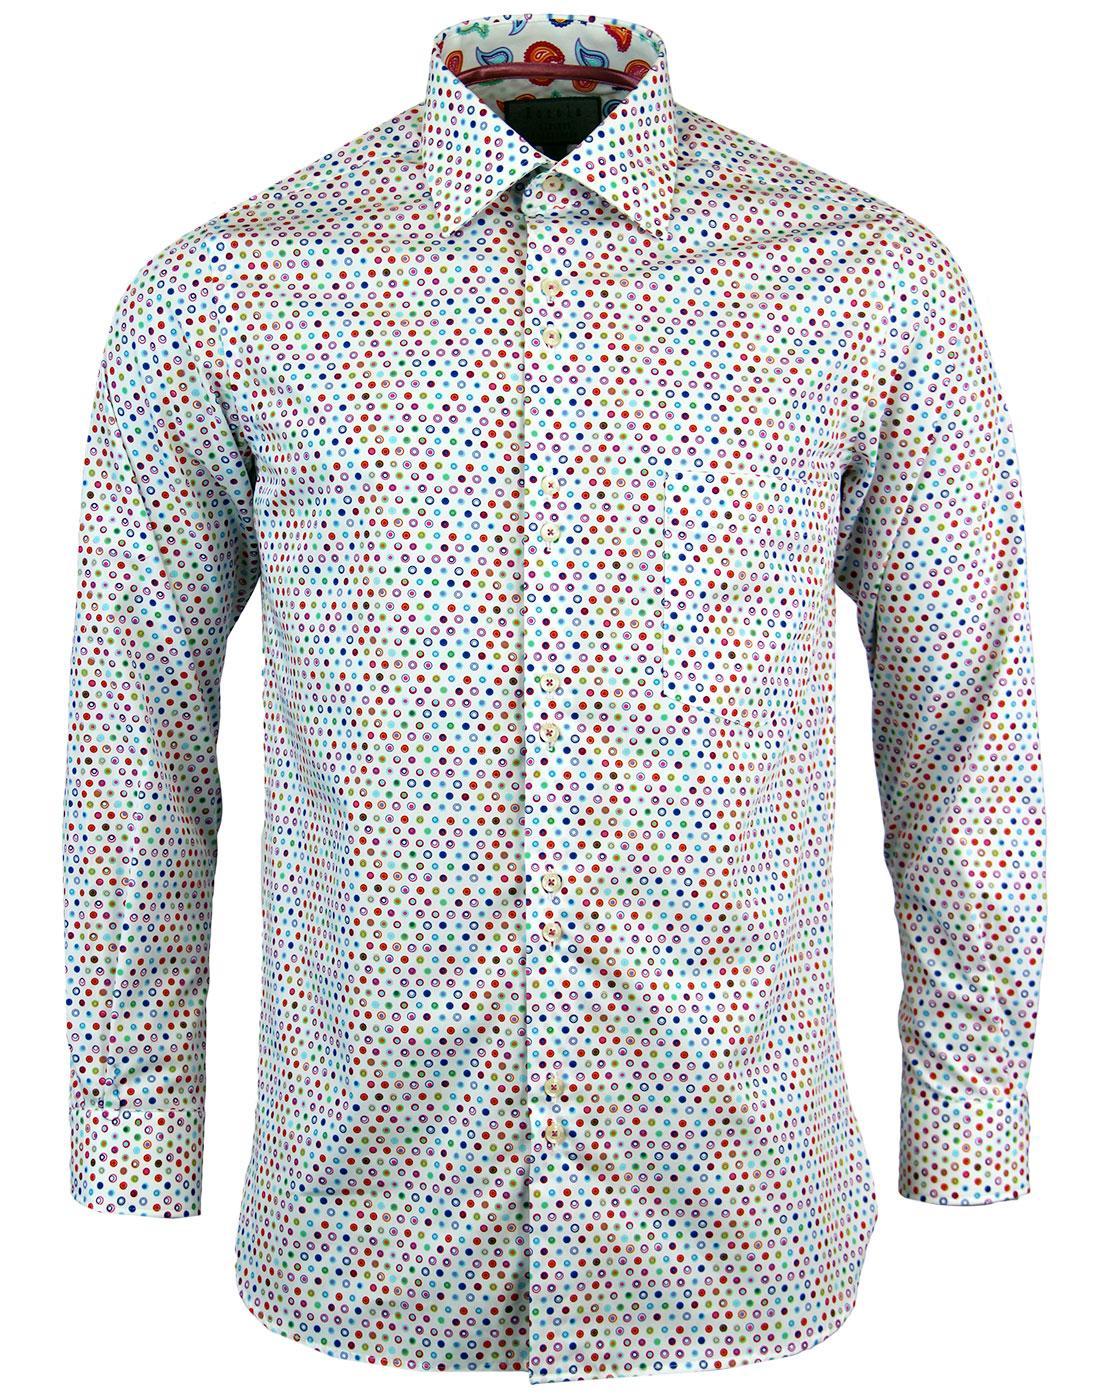 ROCOLA Retro Mini Mod Target Paisley trim Shirt